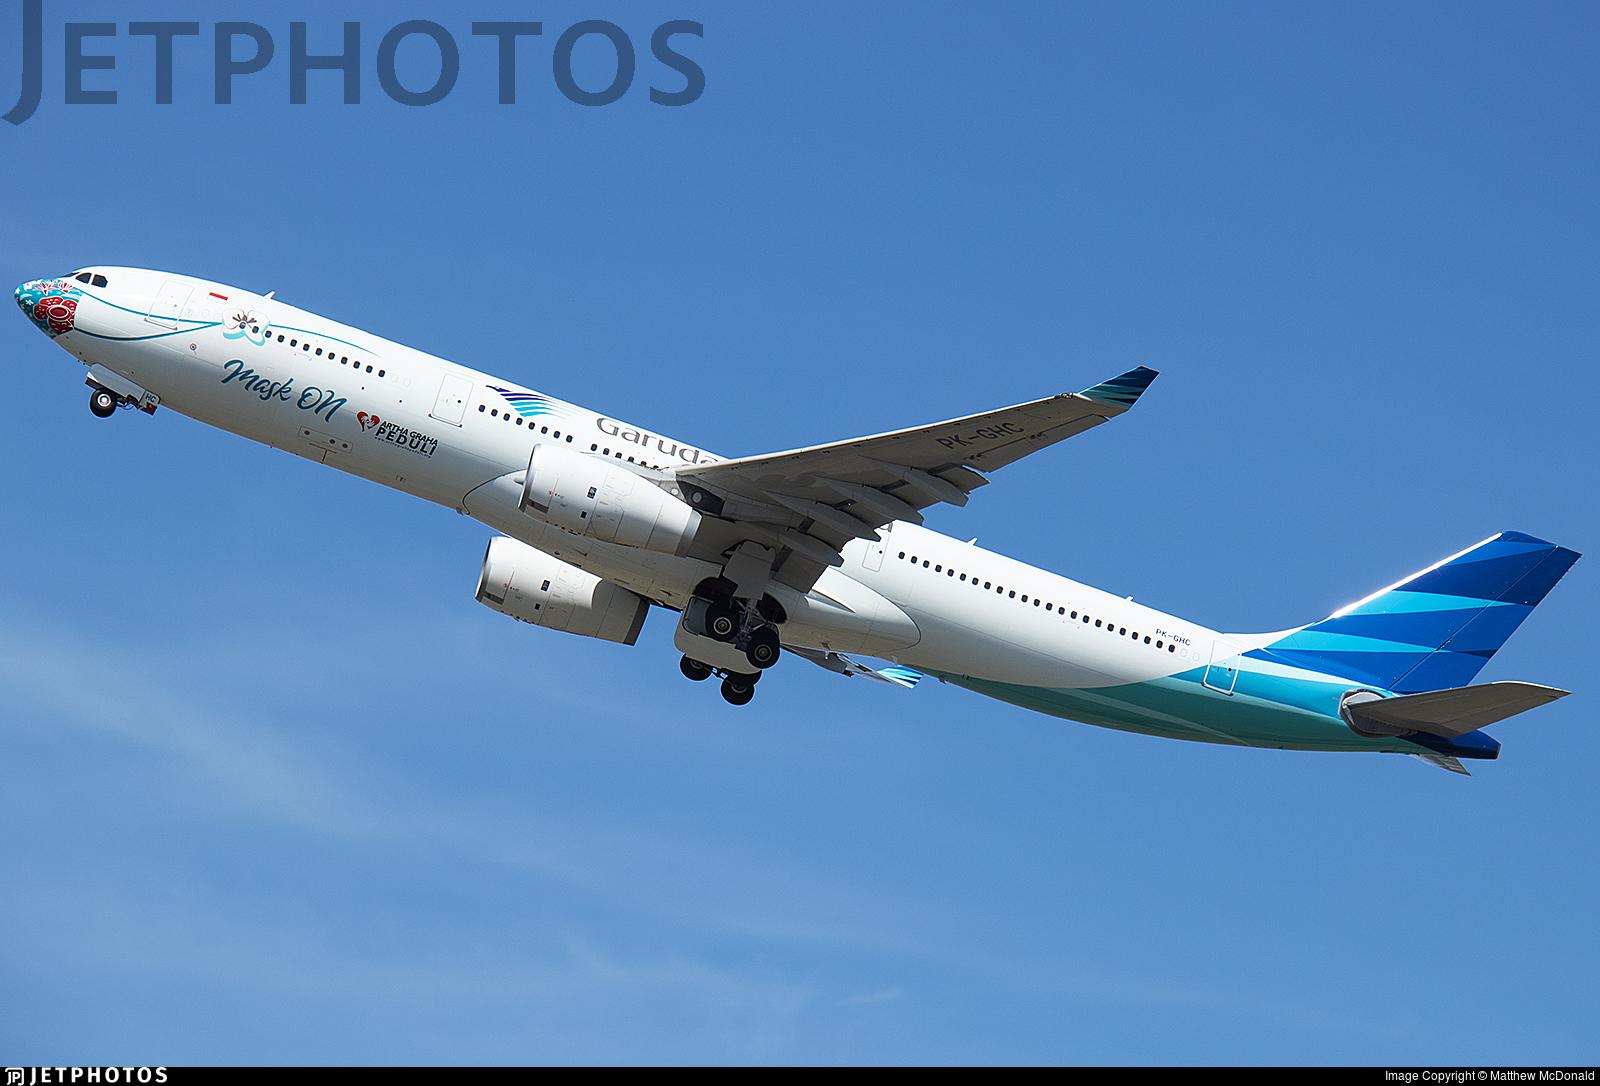 PK-GHC - Airbus A330-343 - Garuda Indonesia